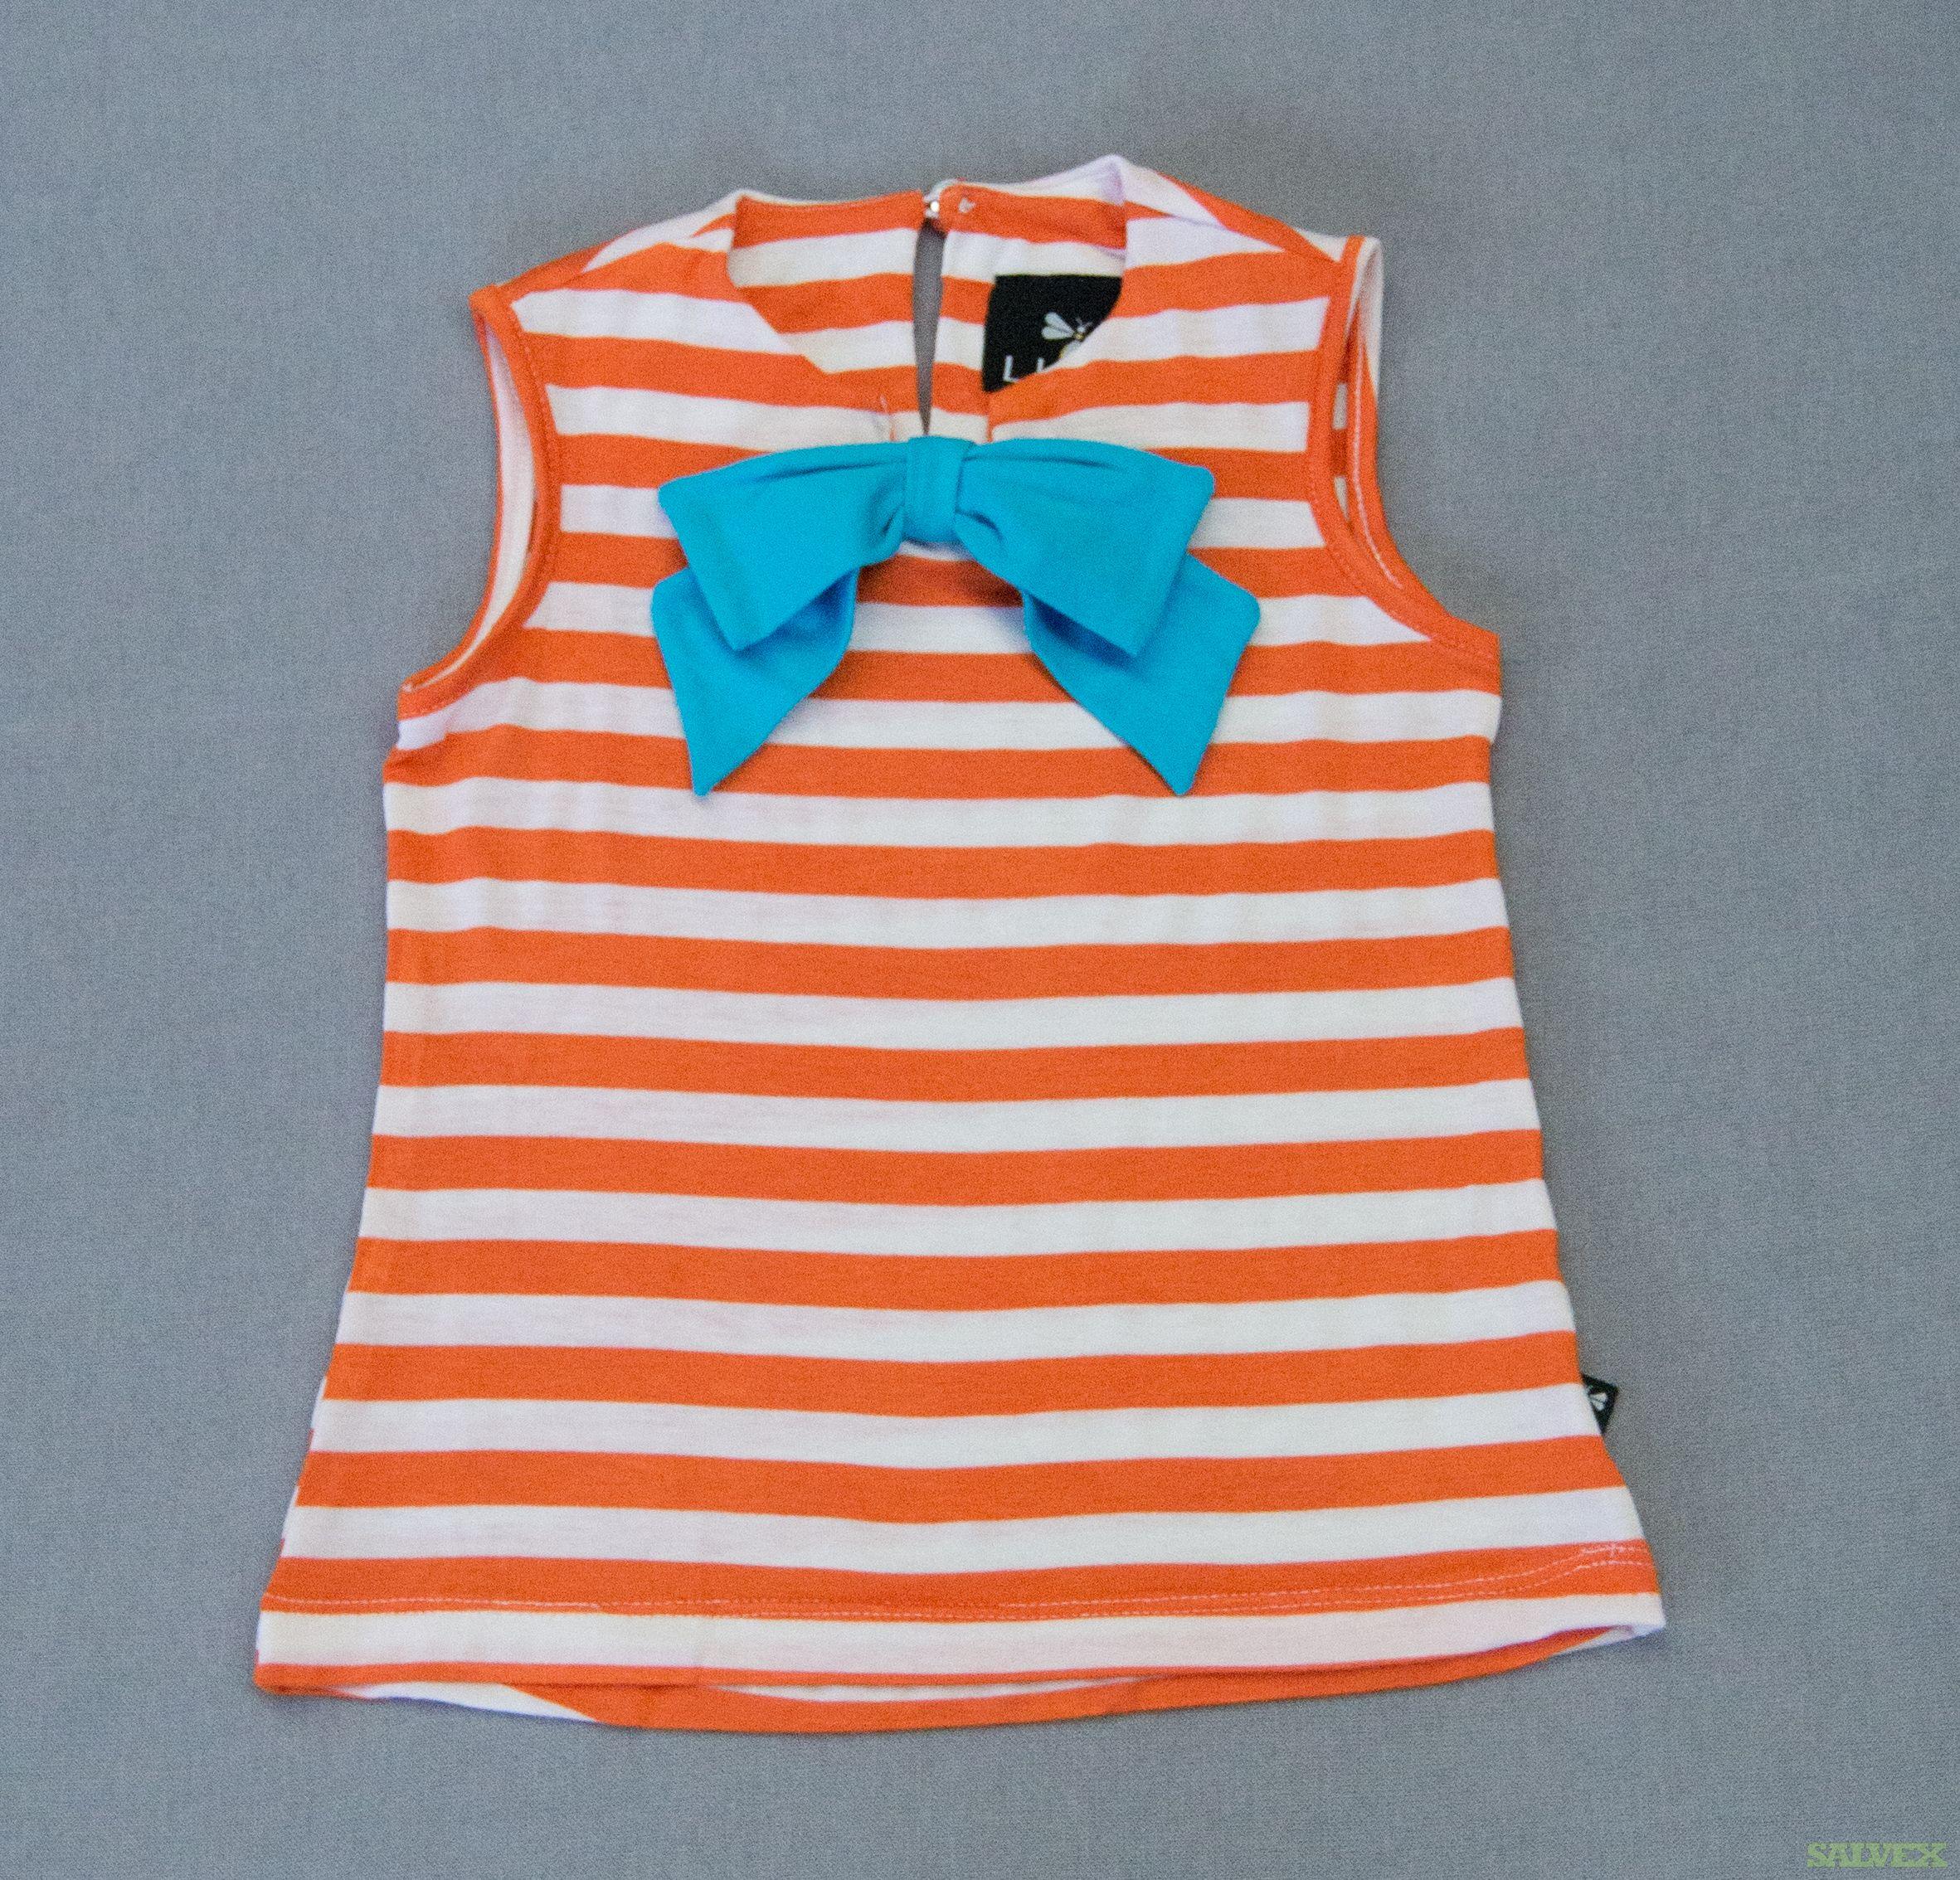 Brand New Striped Toddler-Girls Shirts (N=155, sz 2T-12) in Pennsylvania (155 / Units)